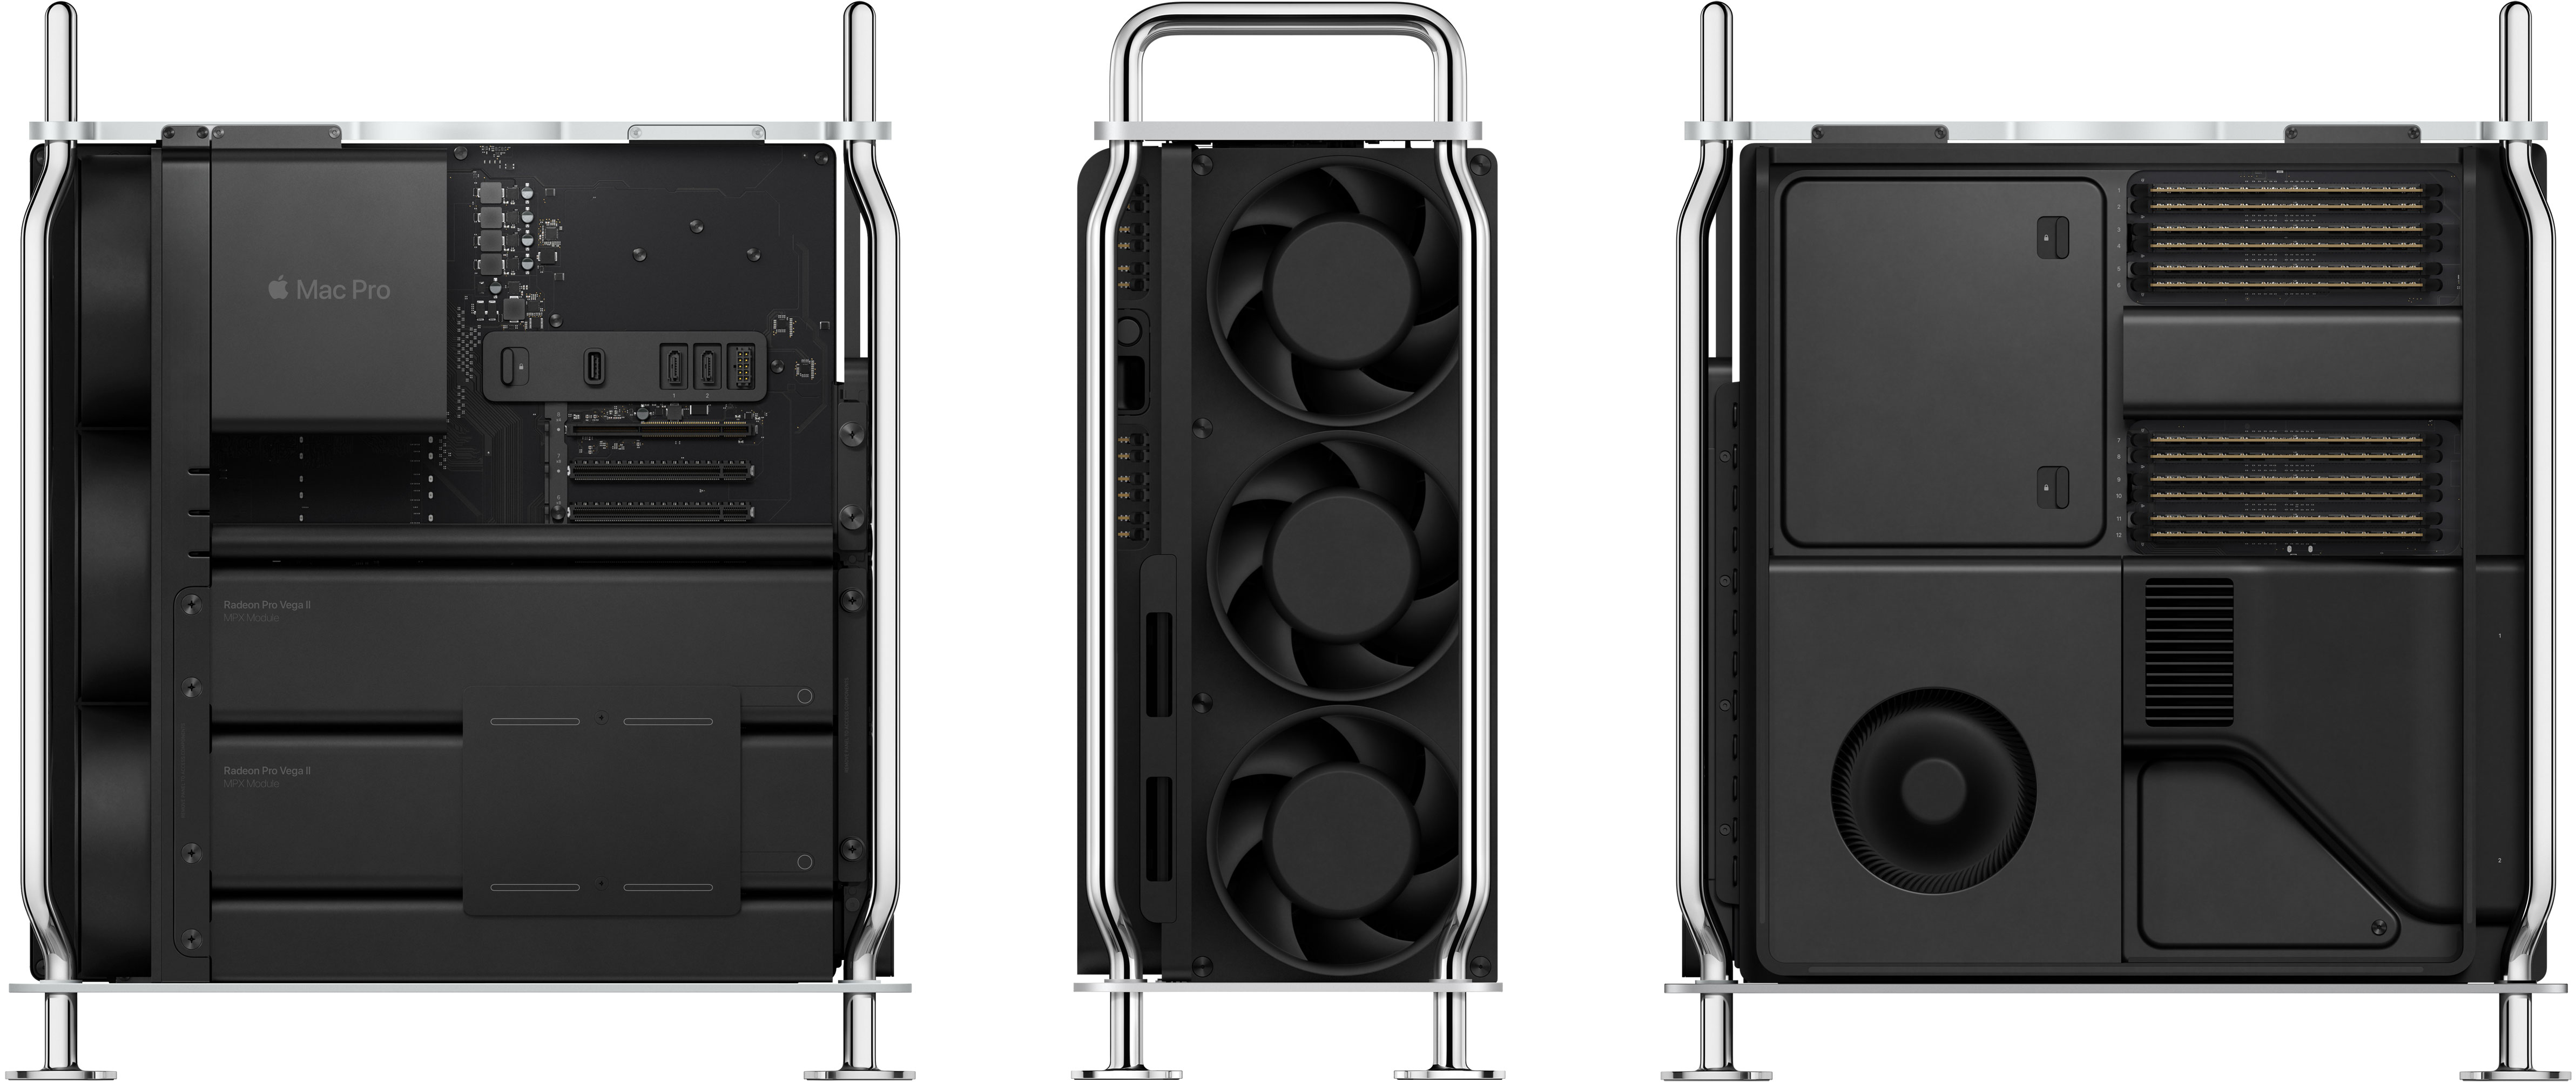 Novo Mac Pro aberto visto por vários ângulos